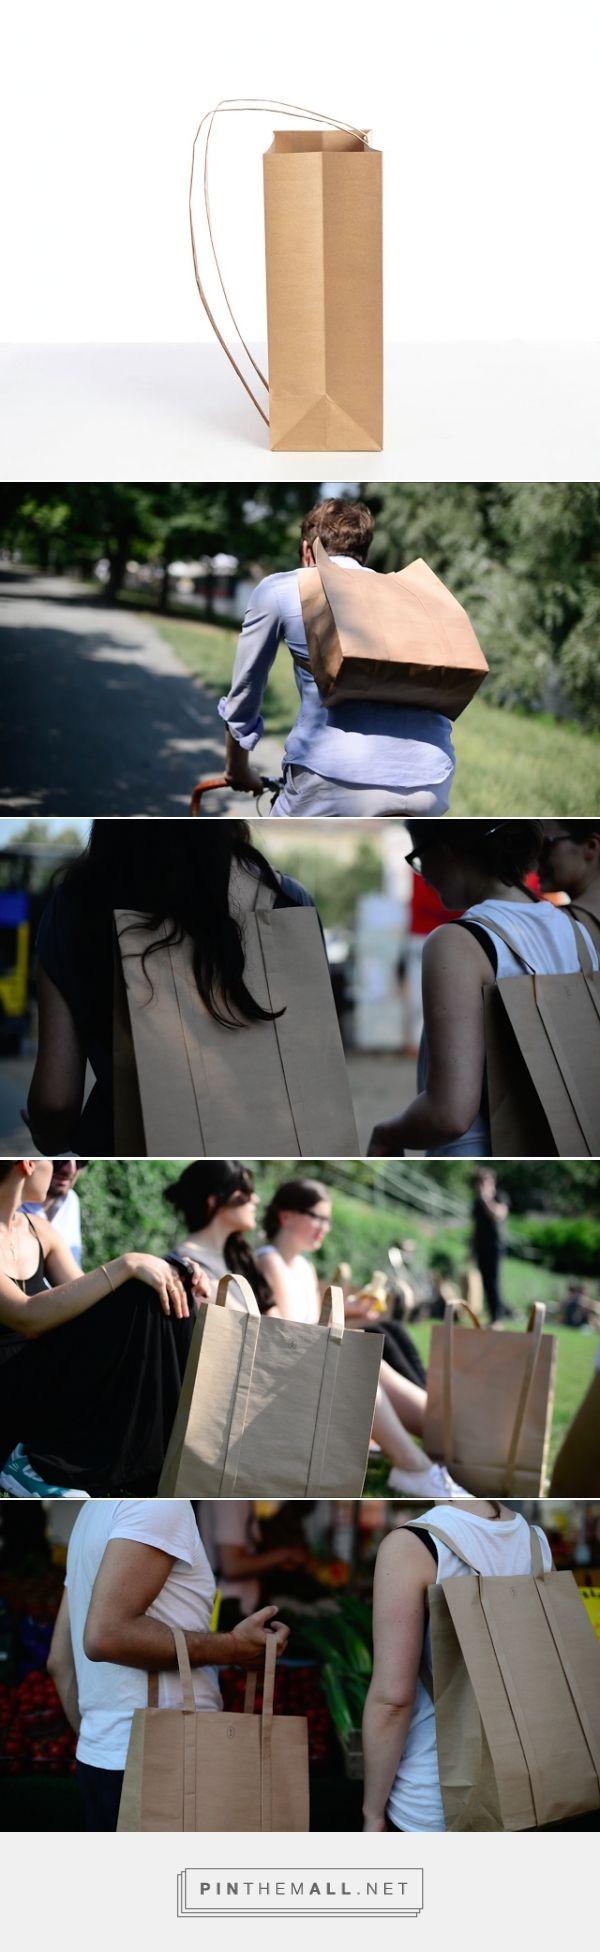 PaperJohn #Concept #paperbag #backpack #packaging designed by OGATA UG - http://www.packagingoftheworld.com/2015/07/paperjohn-concept.html